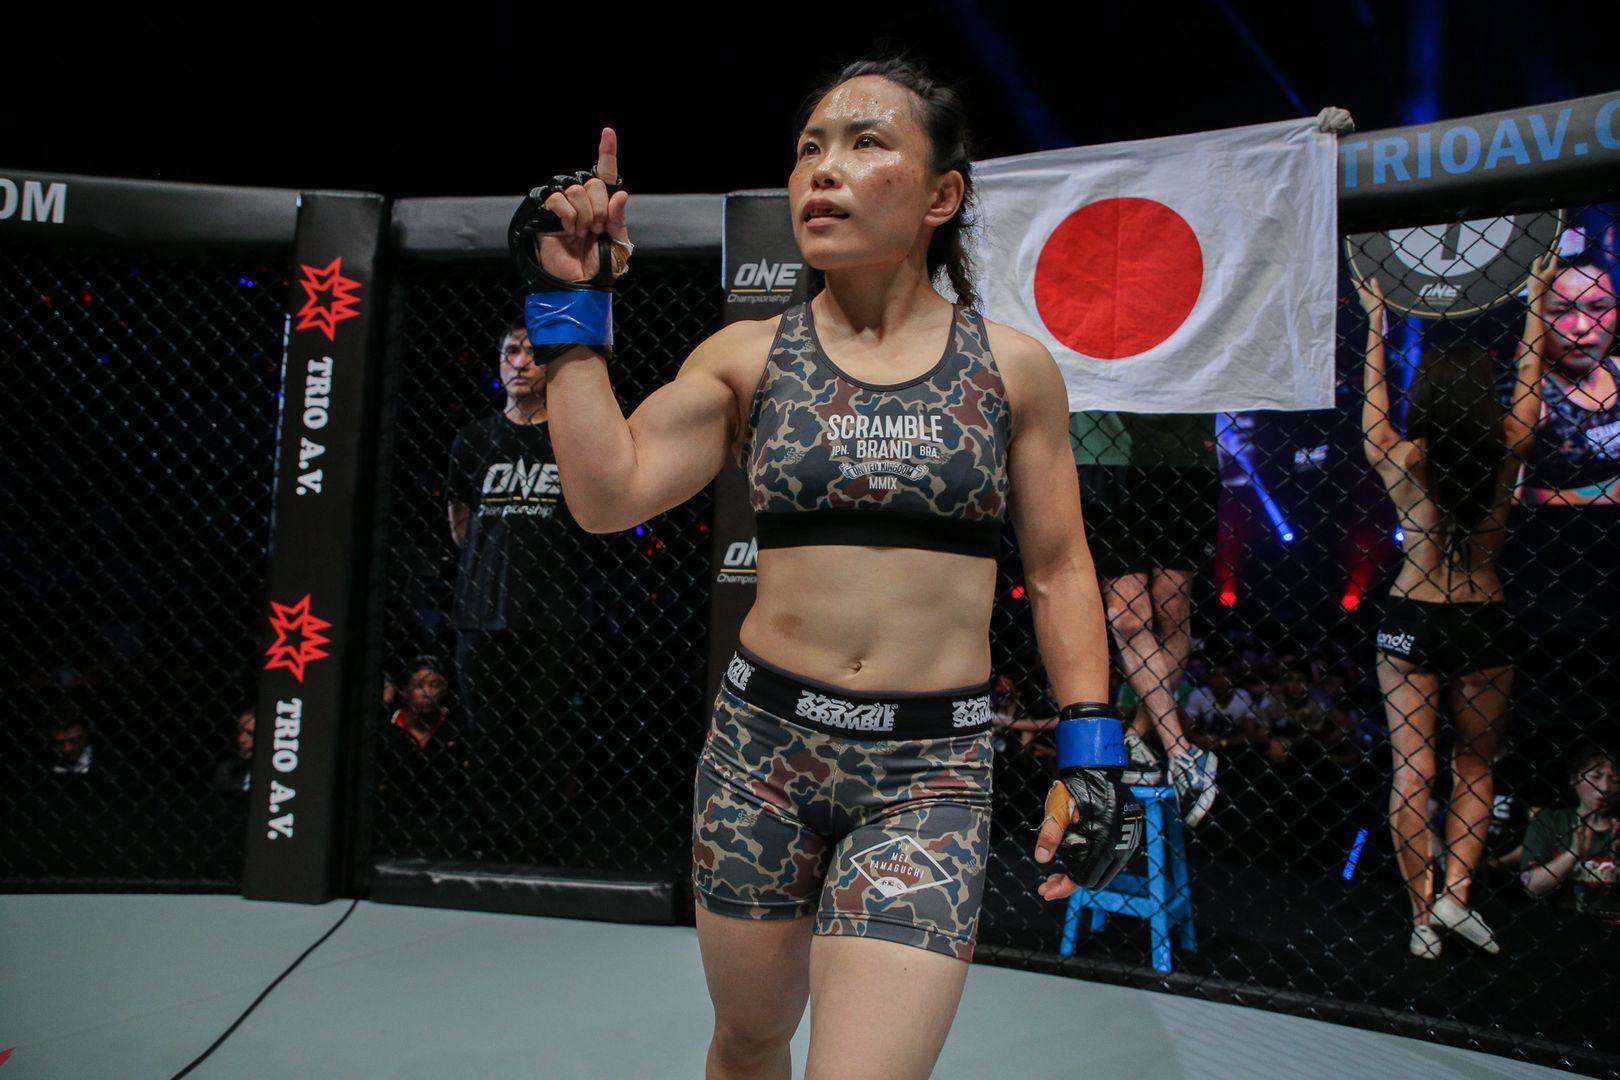 Japanese mixed martial arts star Mei Yamaguchi